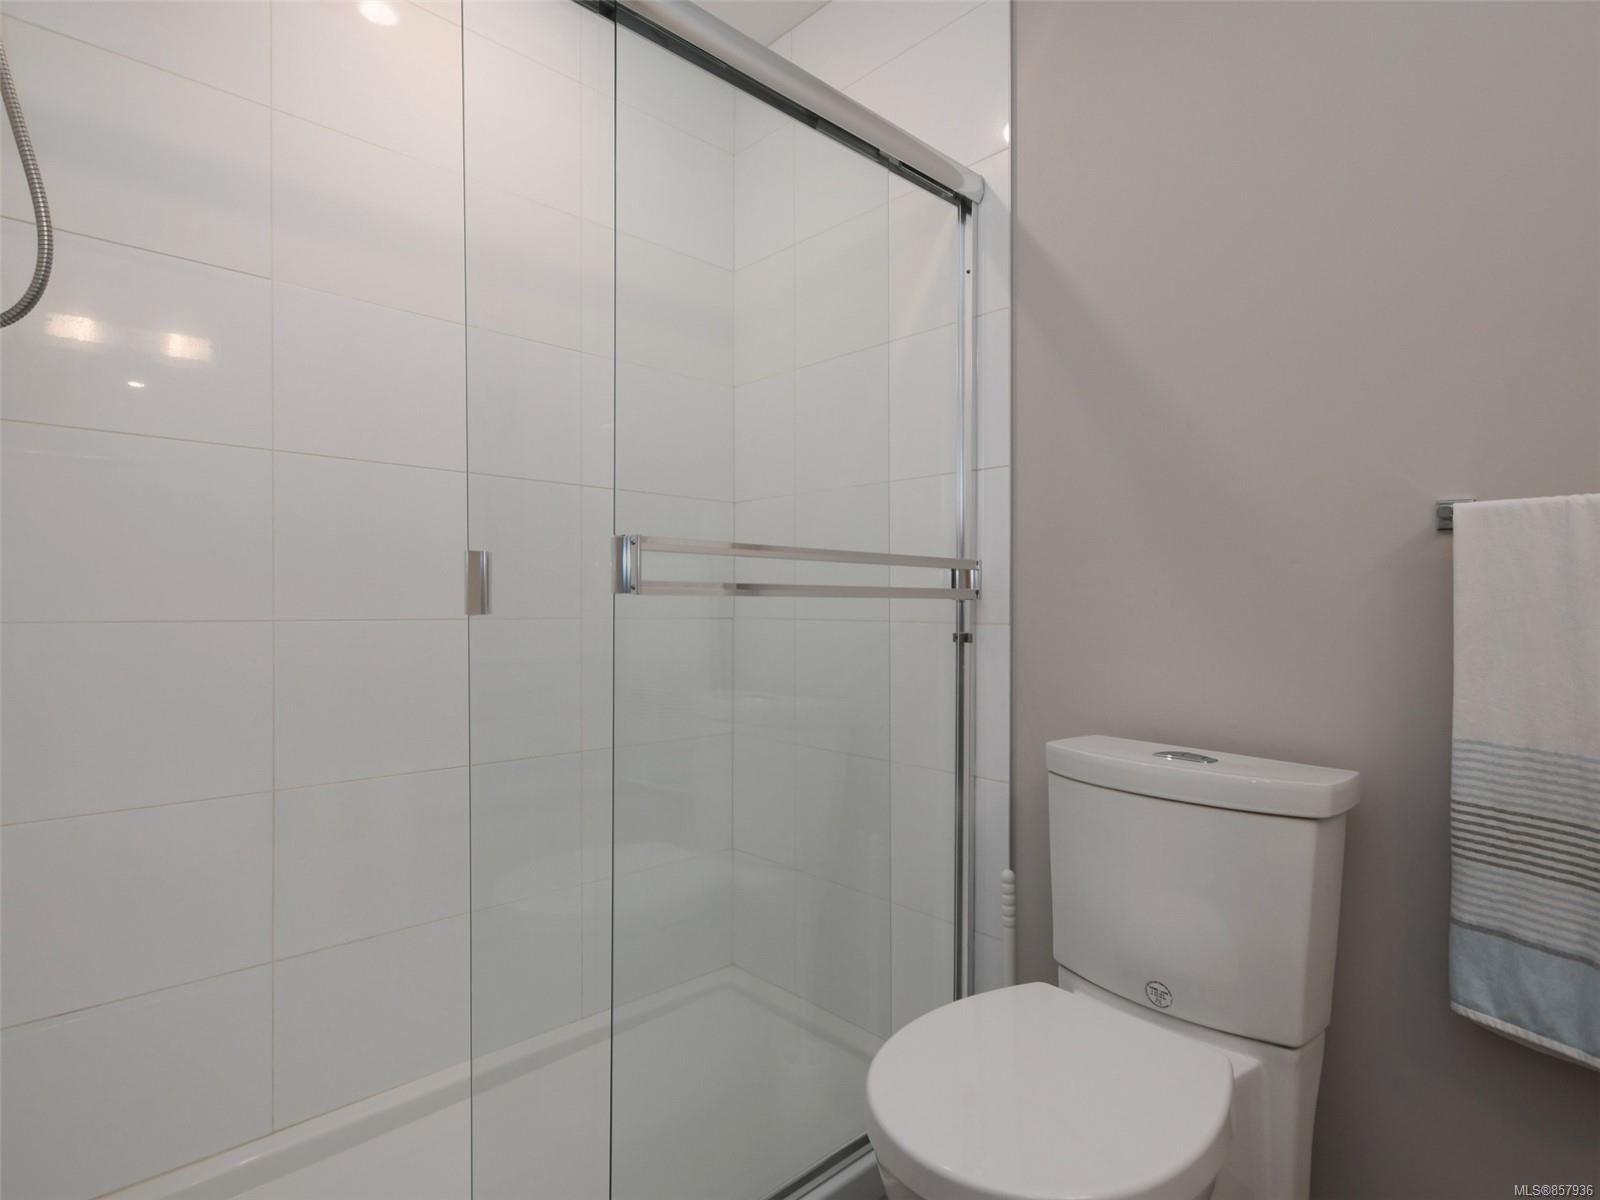 Photo 15: Photos: 103 1020 Inverness Rd in Saanich: SE Quadra Condo for sale (Saanich East)  : MLS®# 857936